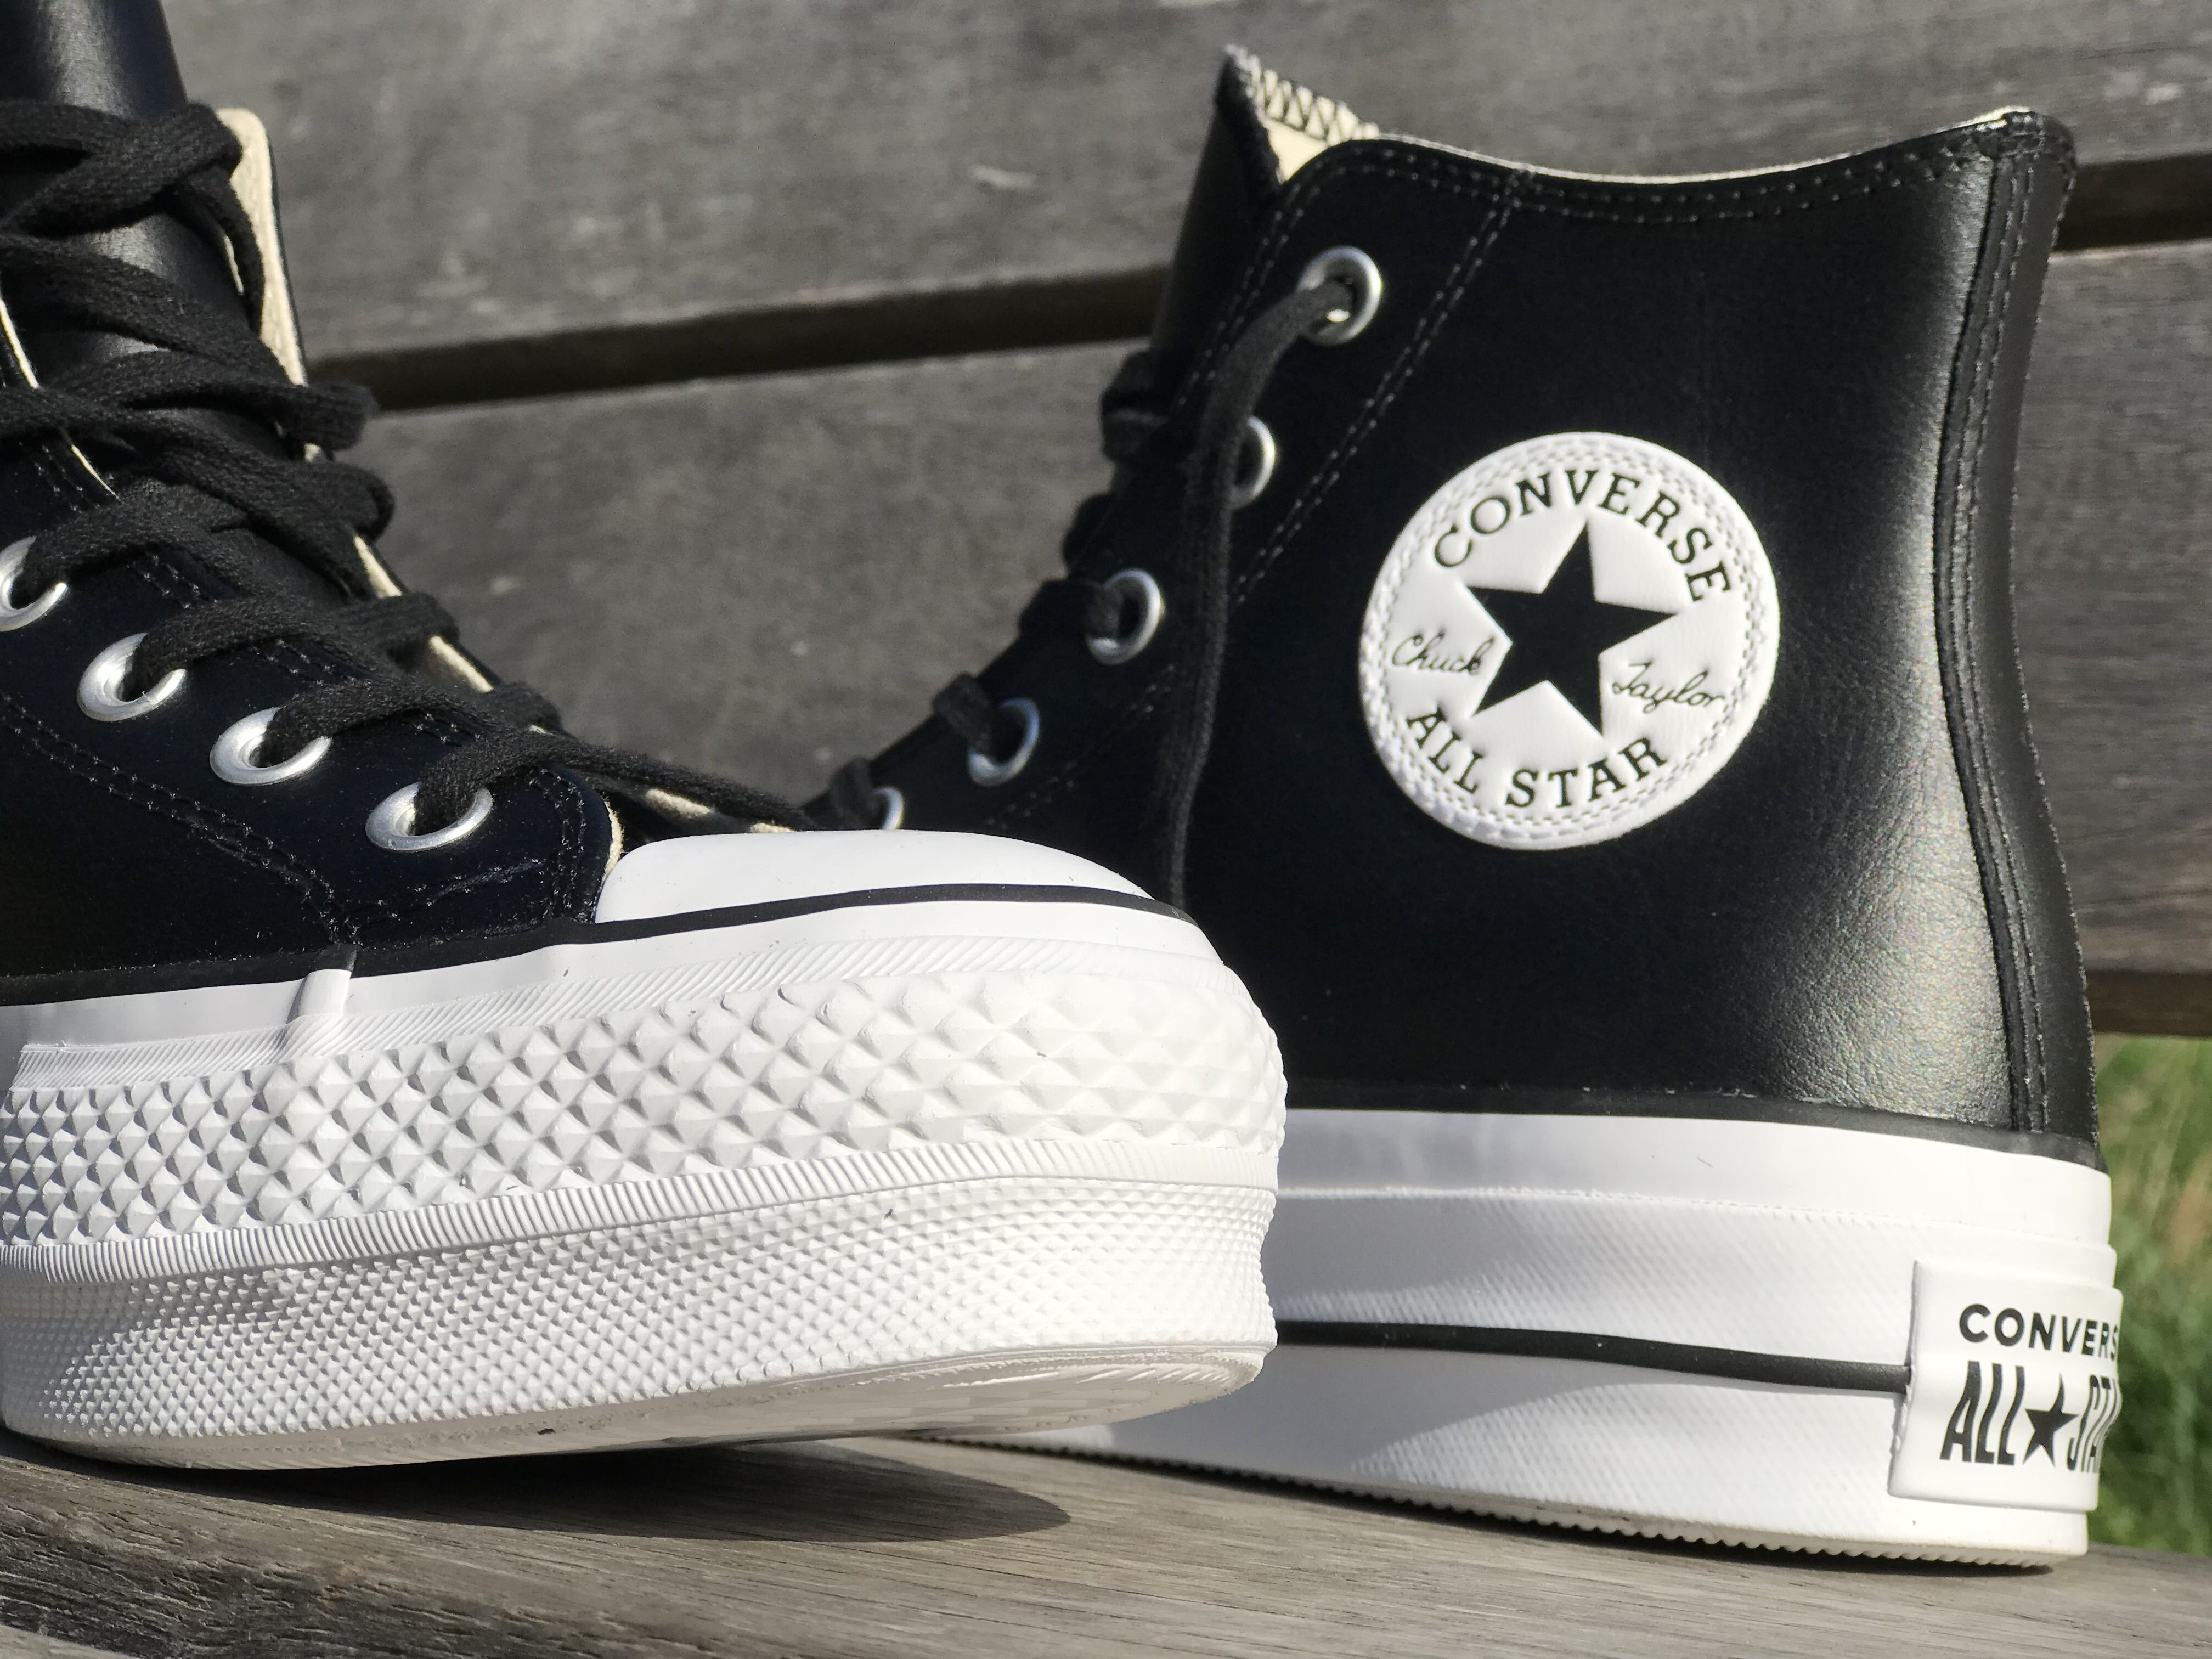 Converse Chuck Taylor All Star Lift Hi ideálne tenisky do